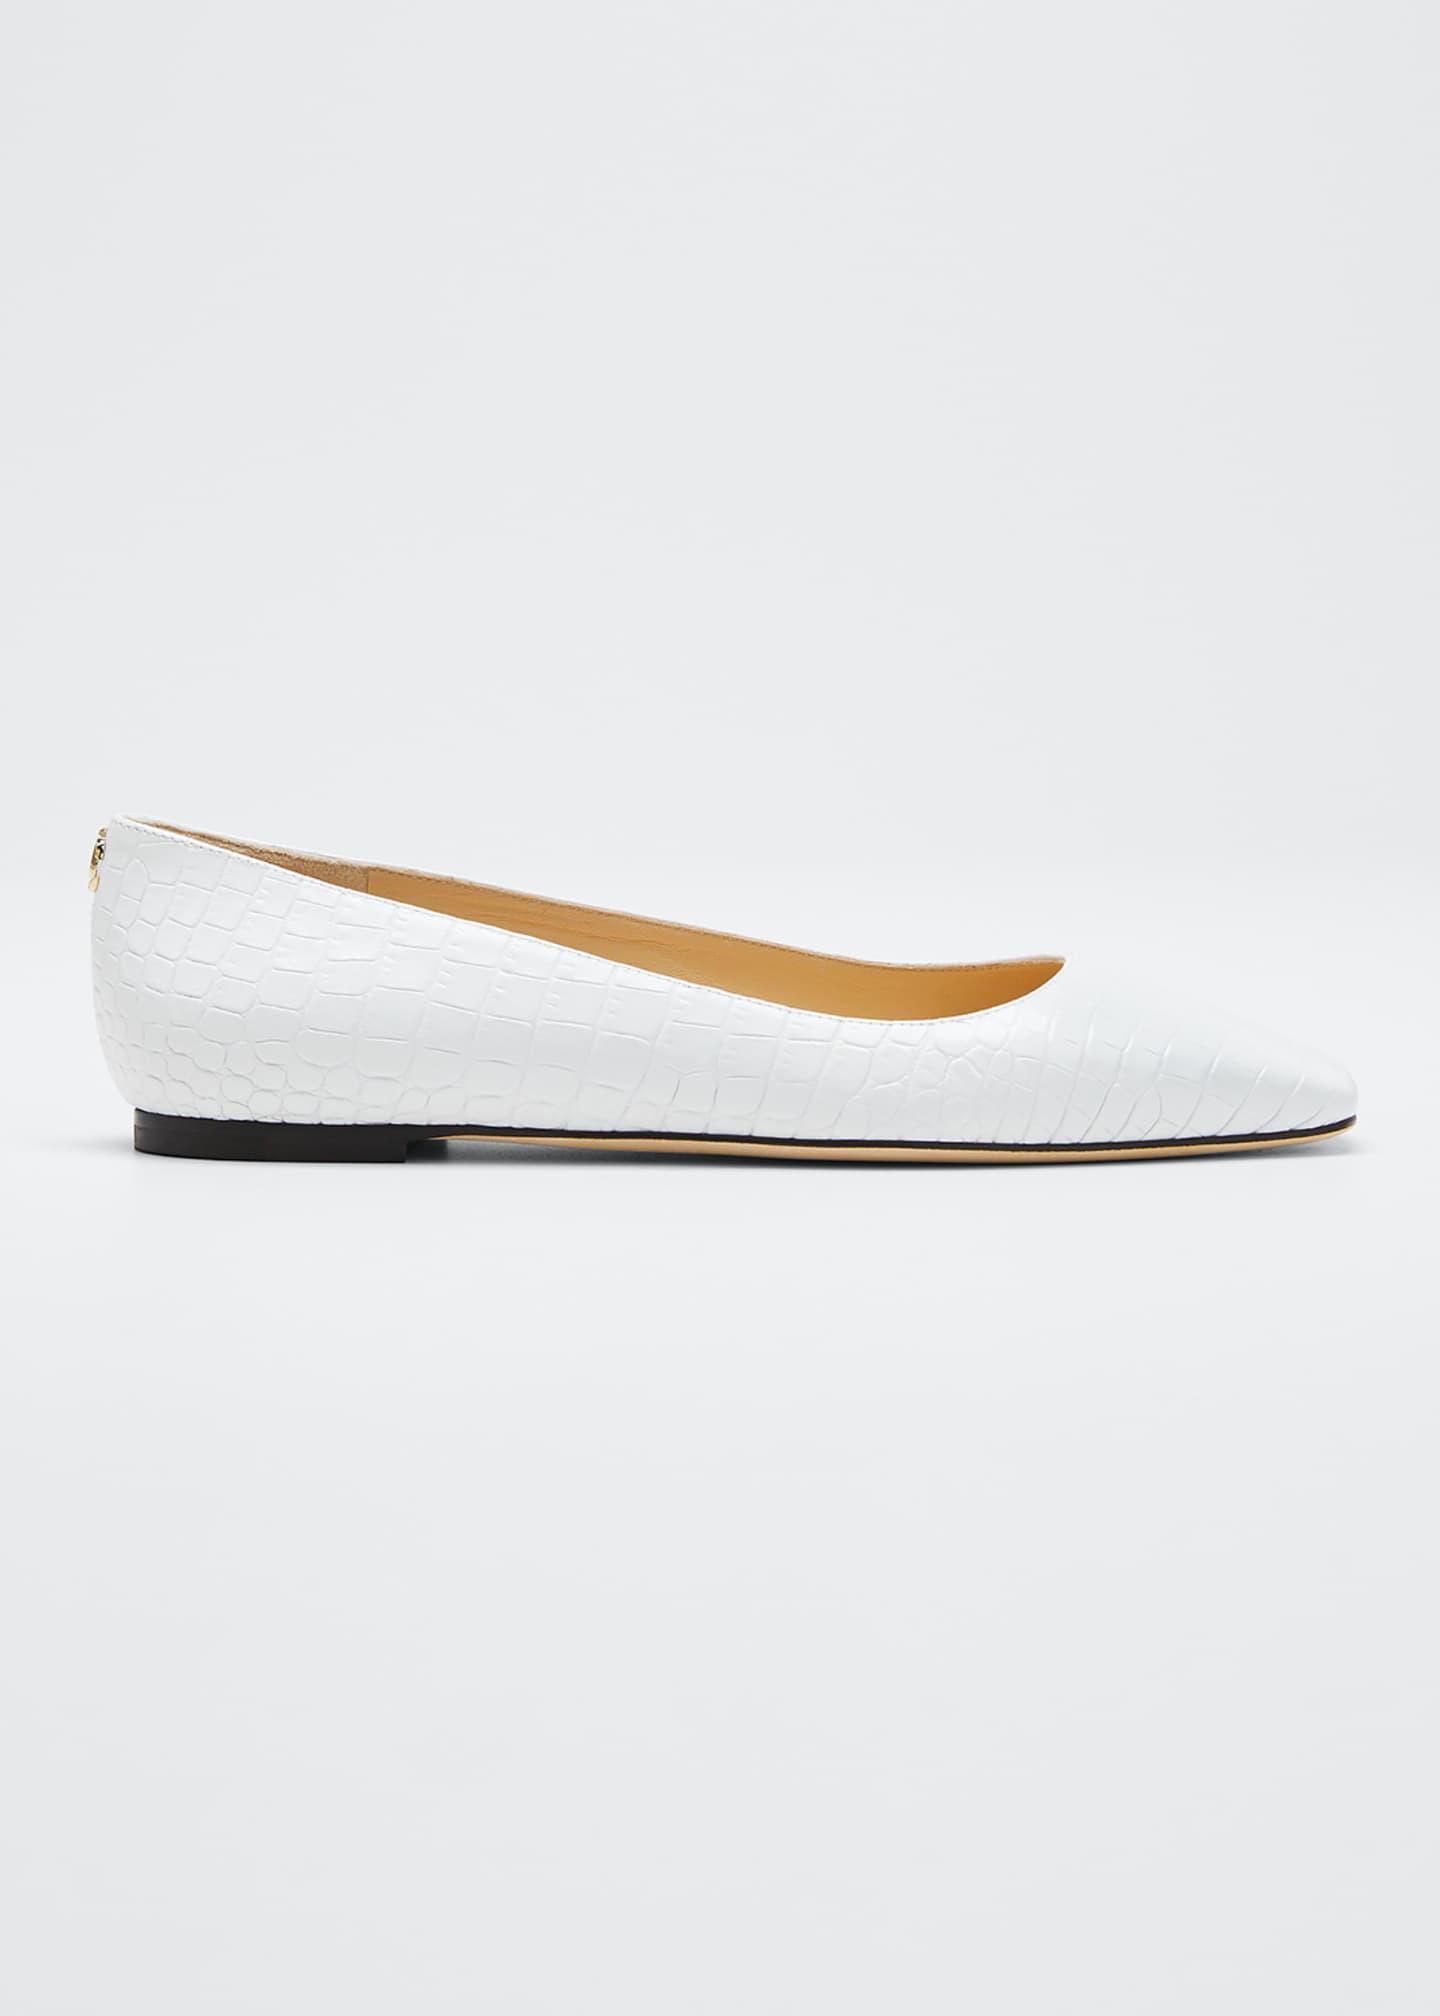 Jimmy Choo Mirele Croc-Embossed Ballet Flats